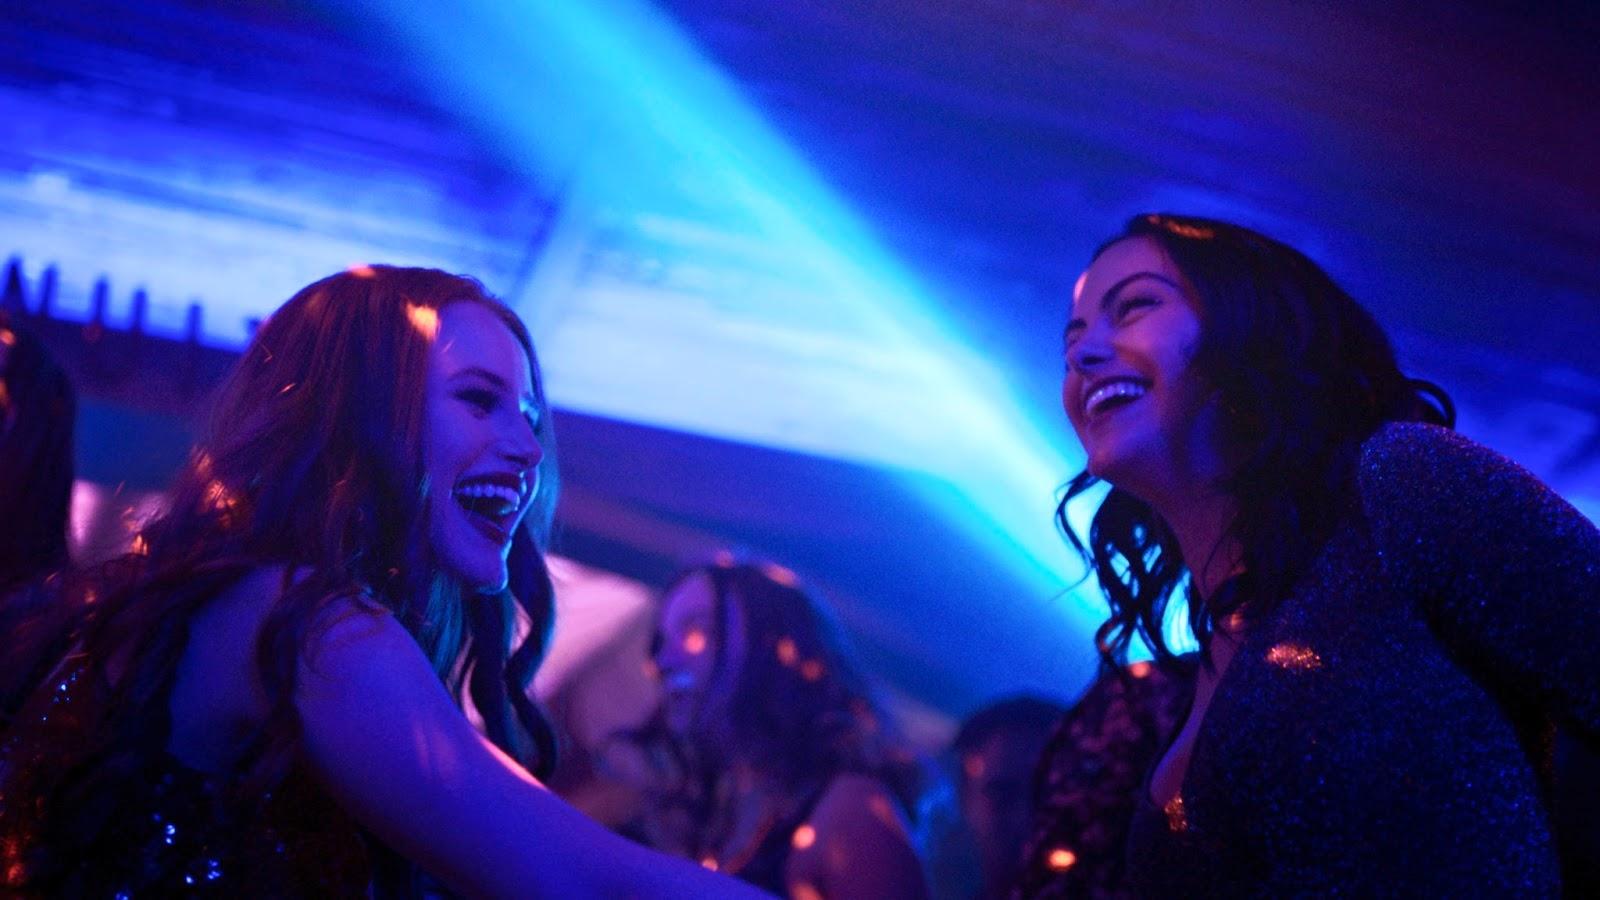 Camila Mendes y Madelaine Petsch en Riverdale